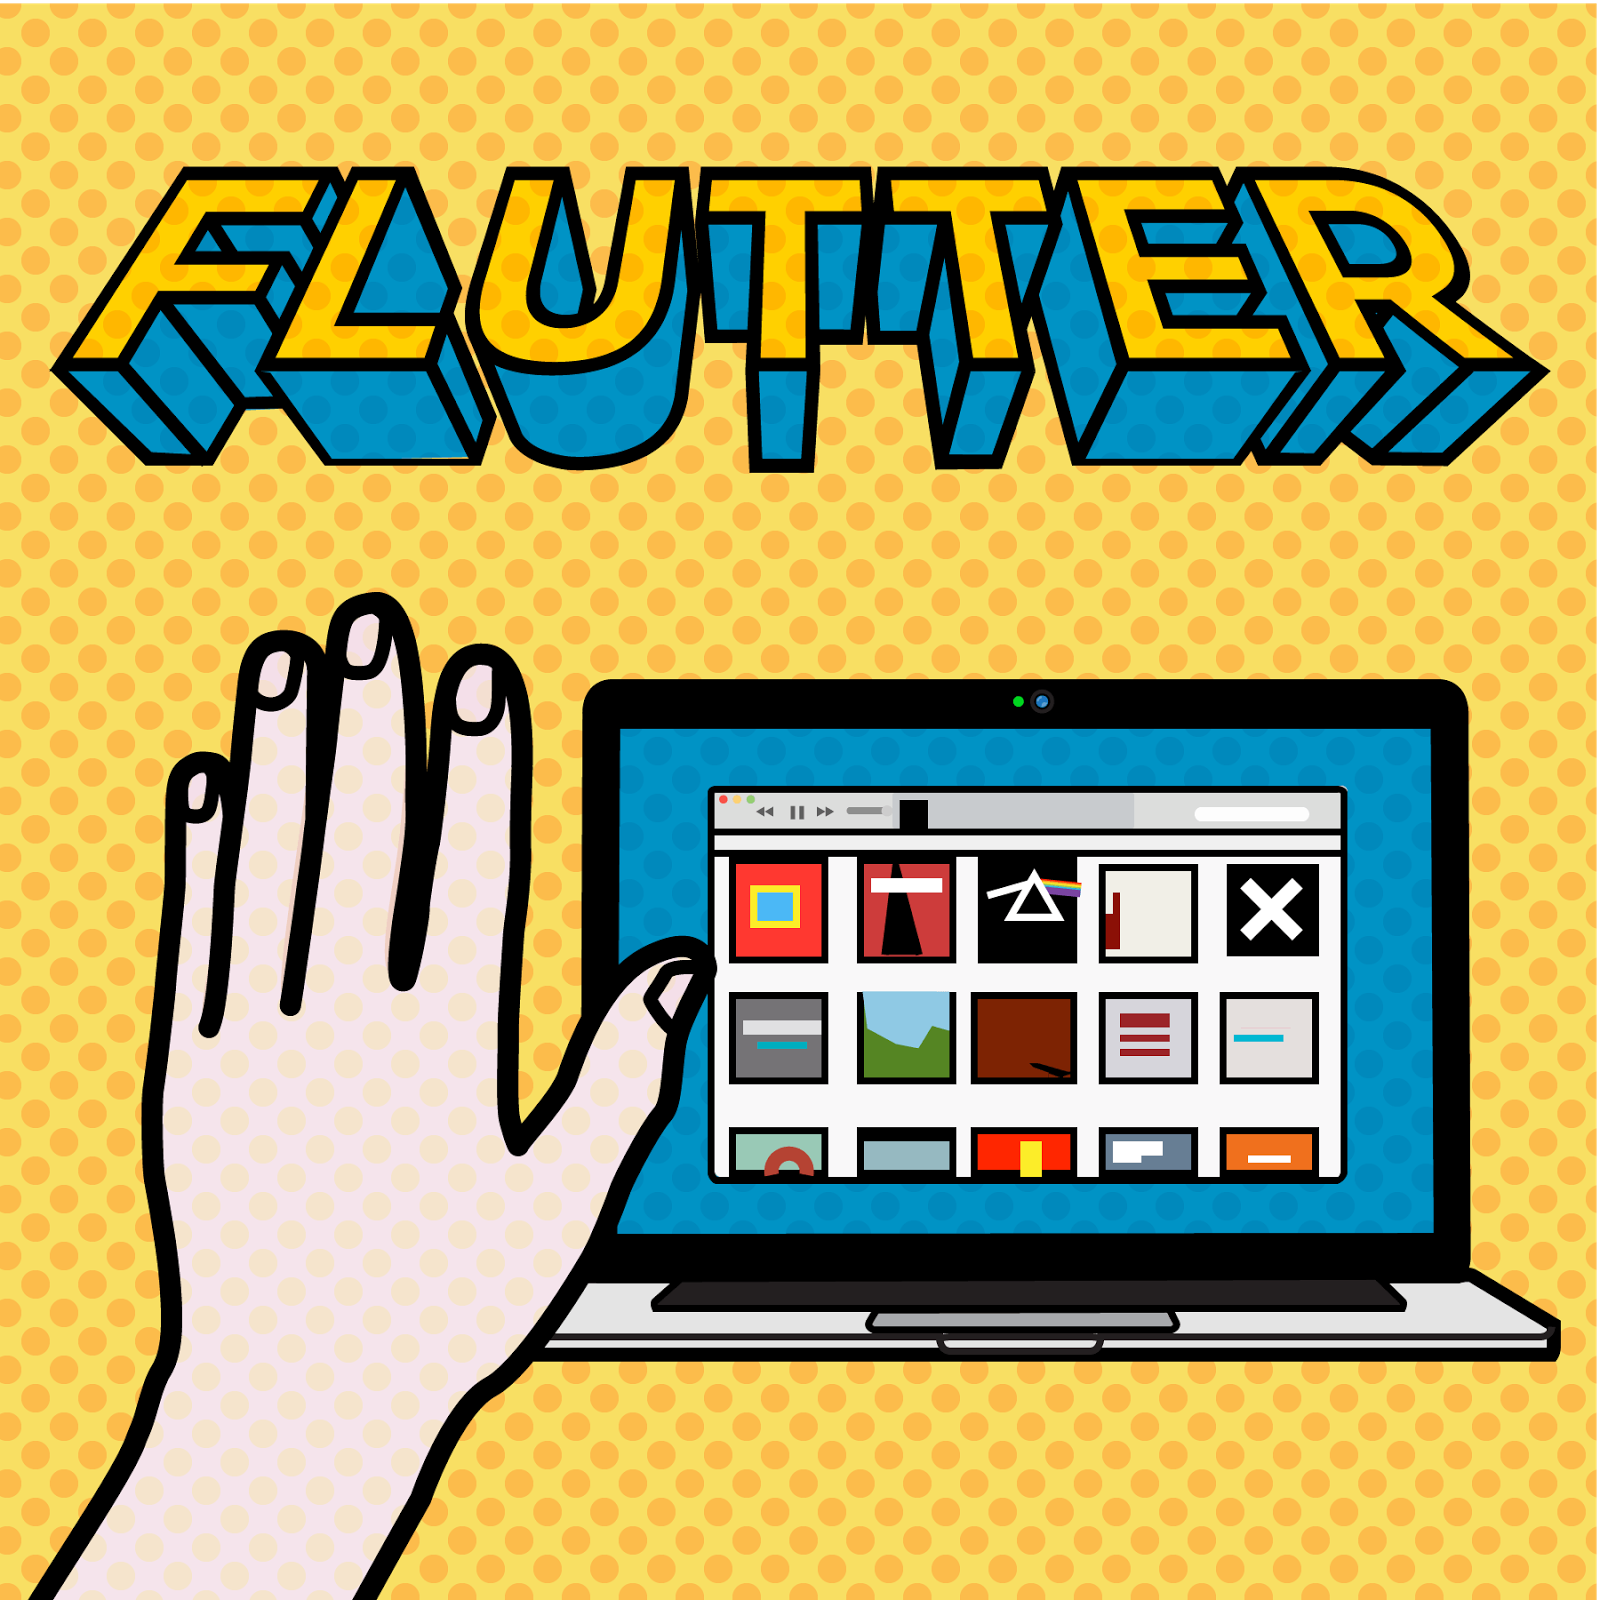 Flutter Gesture Recognition App For PC Full Version Free